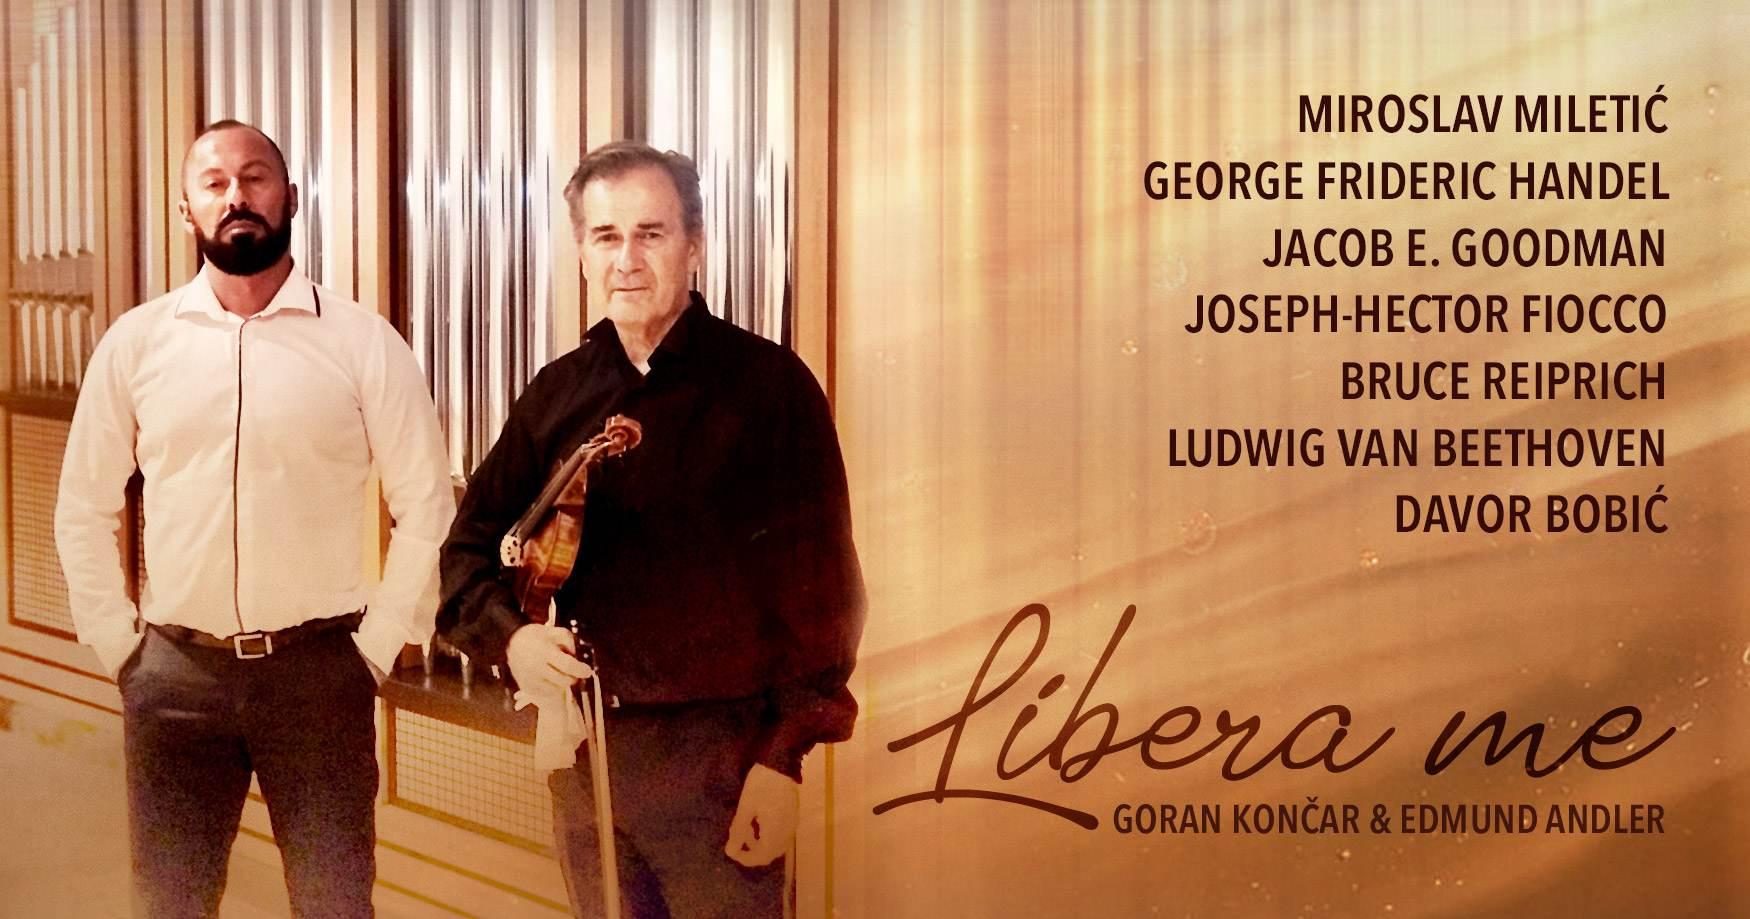 Libera Me event poster